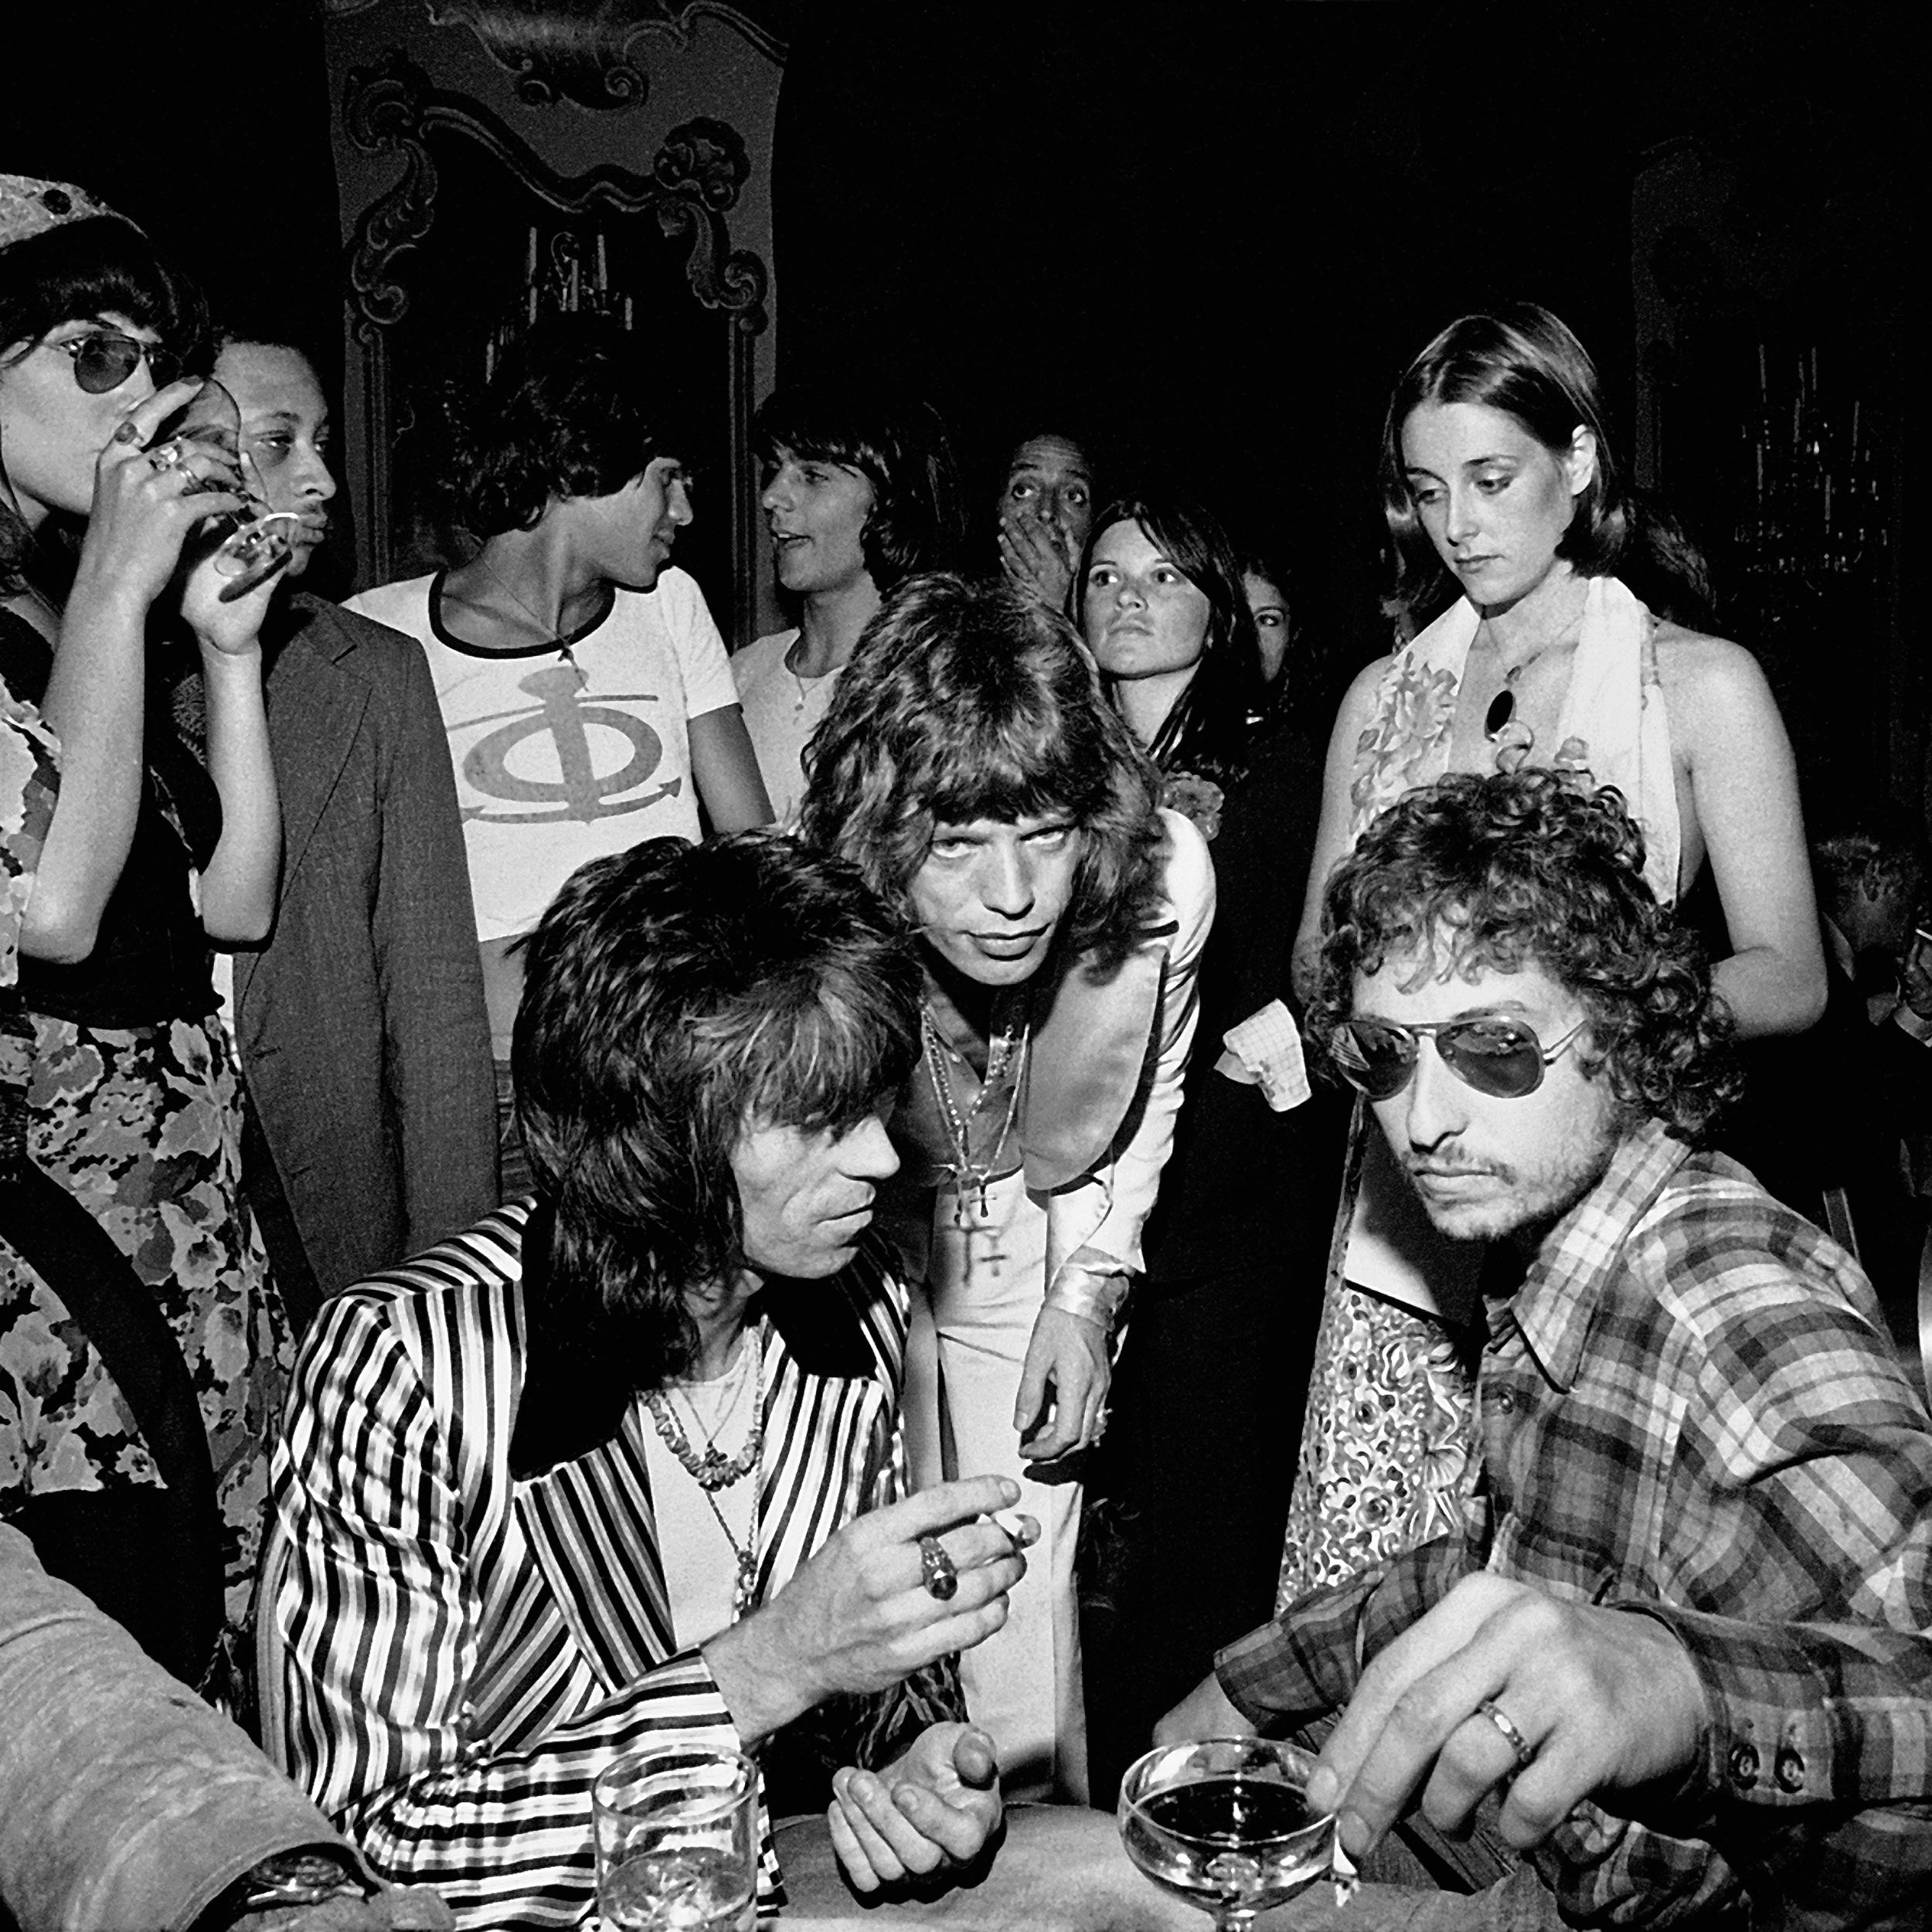 1972 Keith Richards, Mick Jagger and Bob Dylan